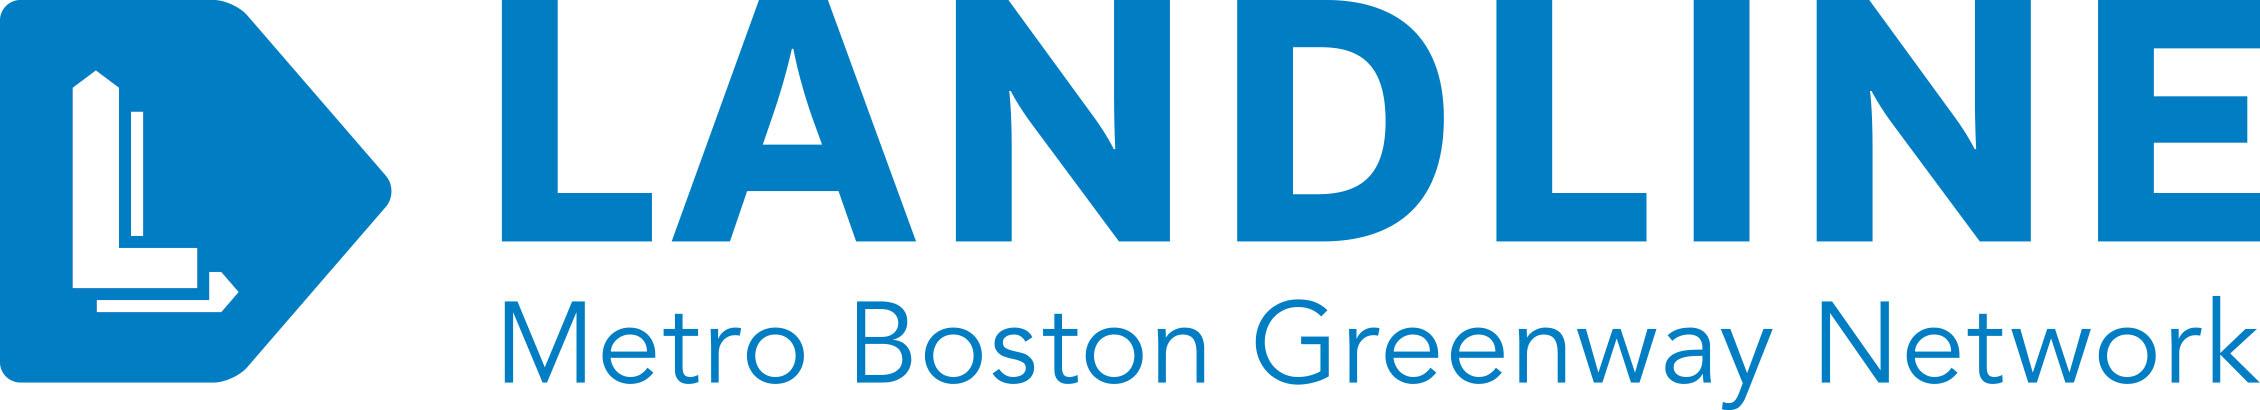 LANDLINE_logo-combined_(2).jpg